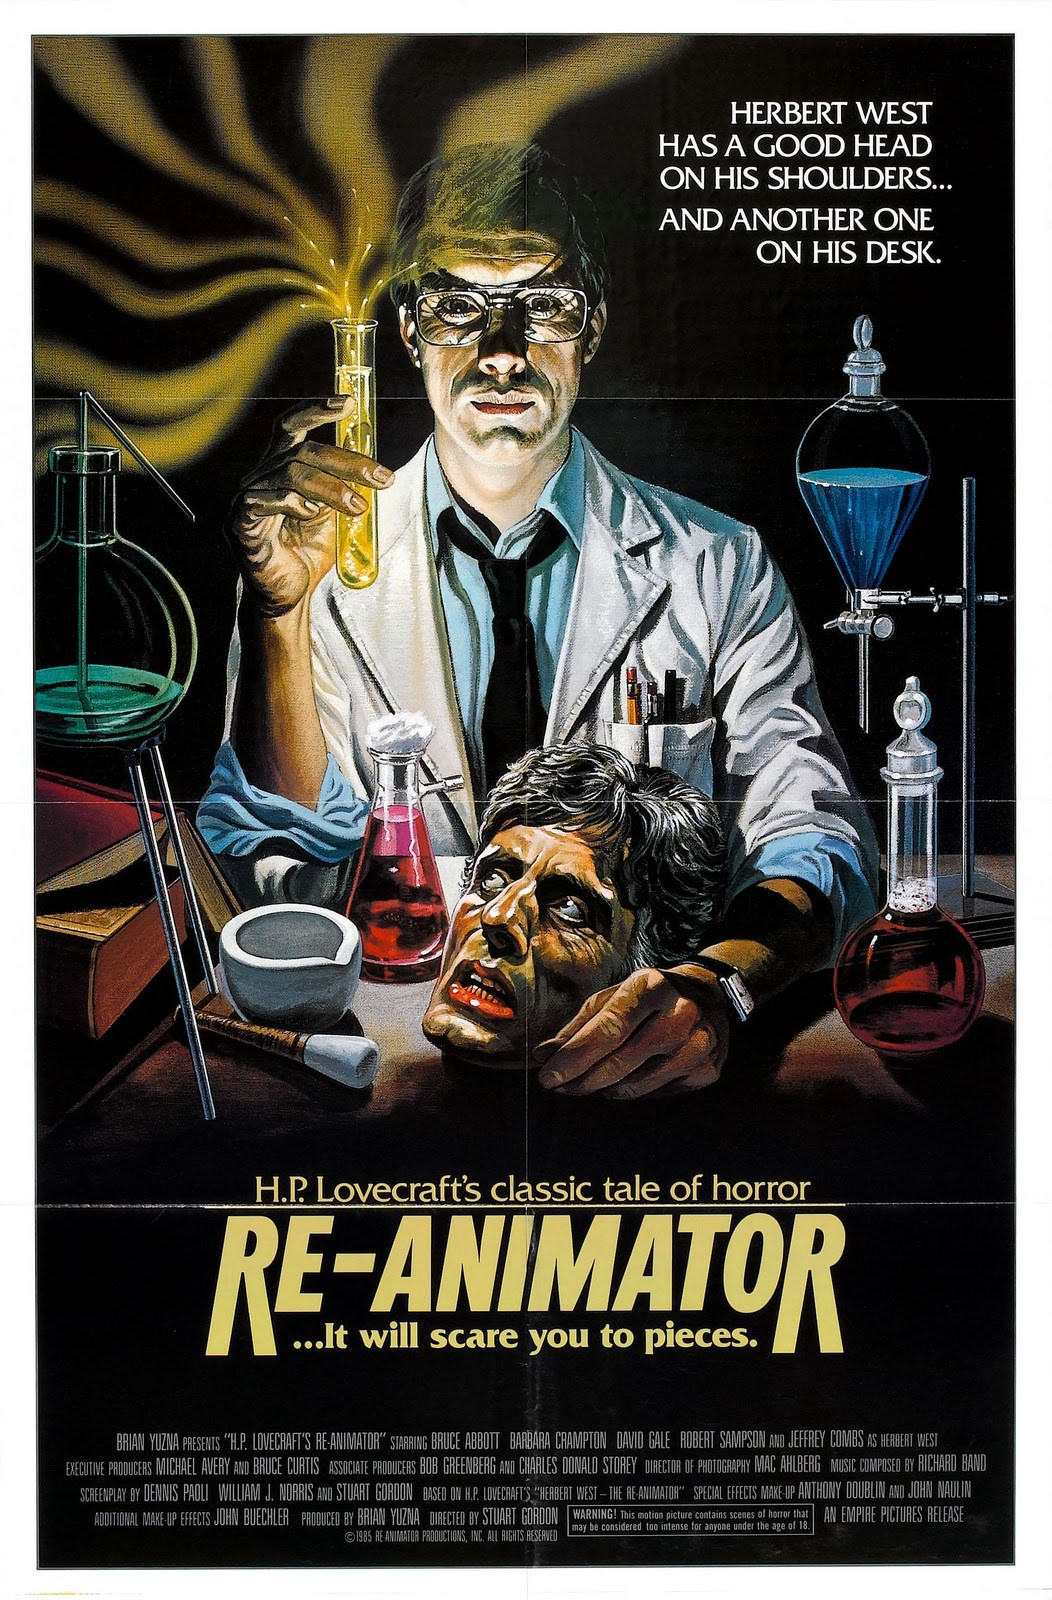 LOVECRAFT et le cinéma : Re-Animator